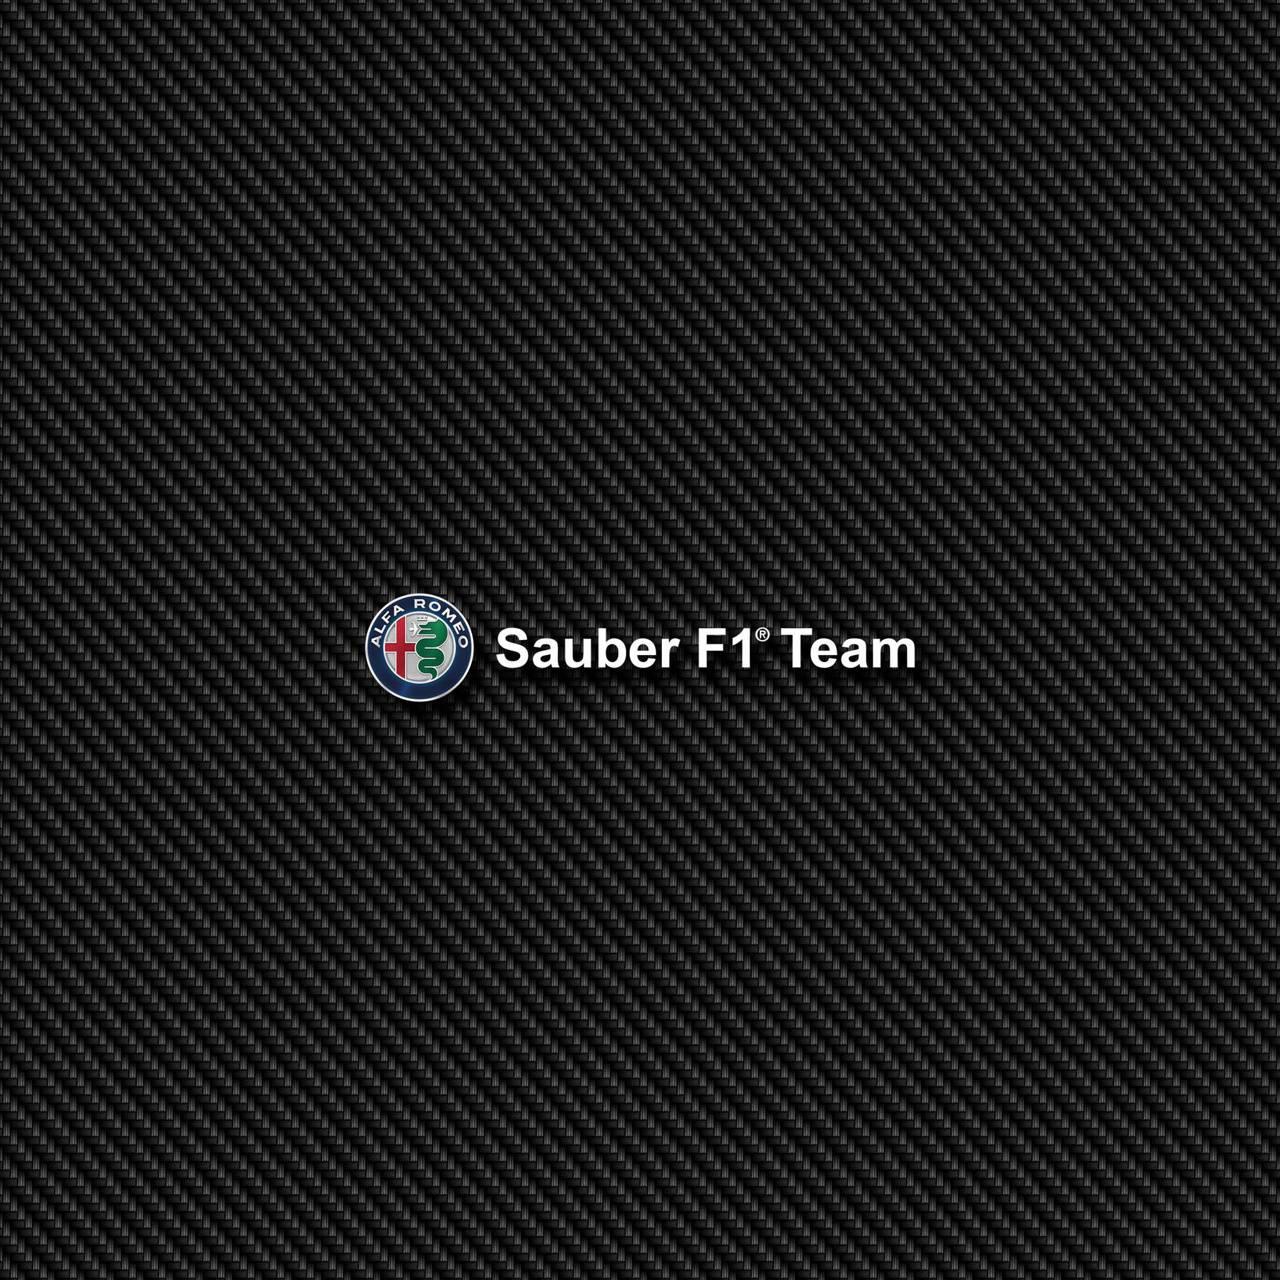 F1 Sauber Carbon